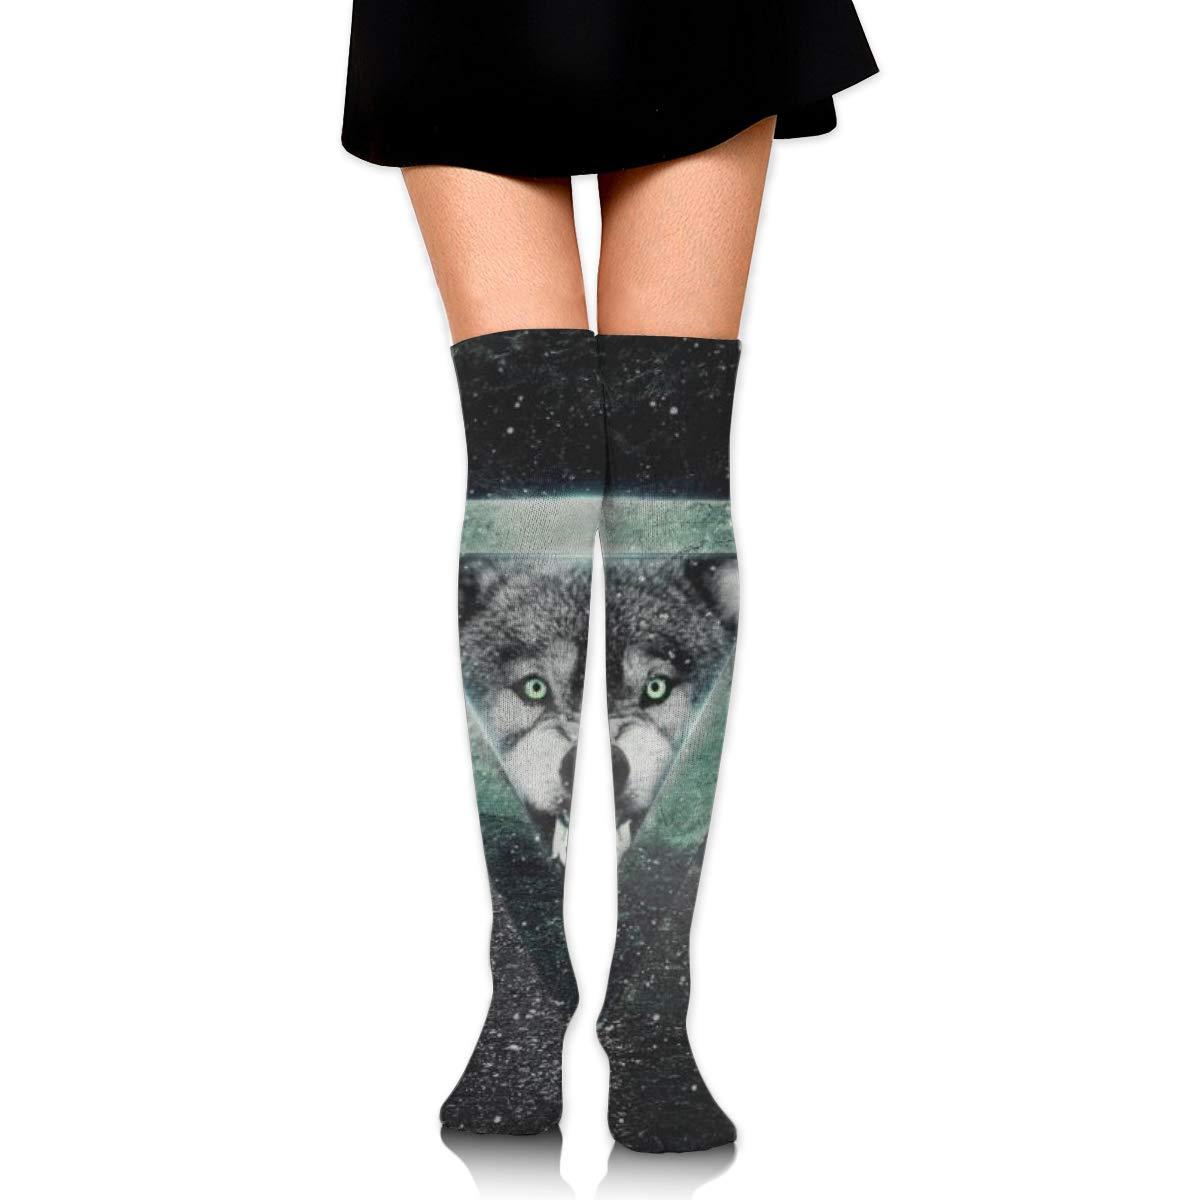 Kjaoi Girl Skirt Socks Uniform Triangle Wolf Women Tube Socks Compression Socks